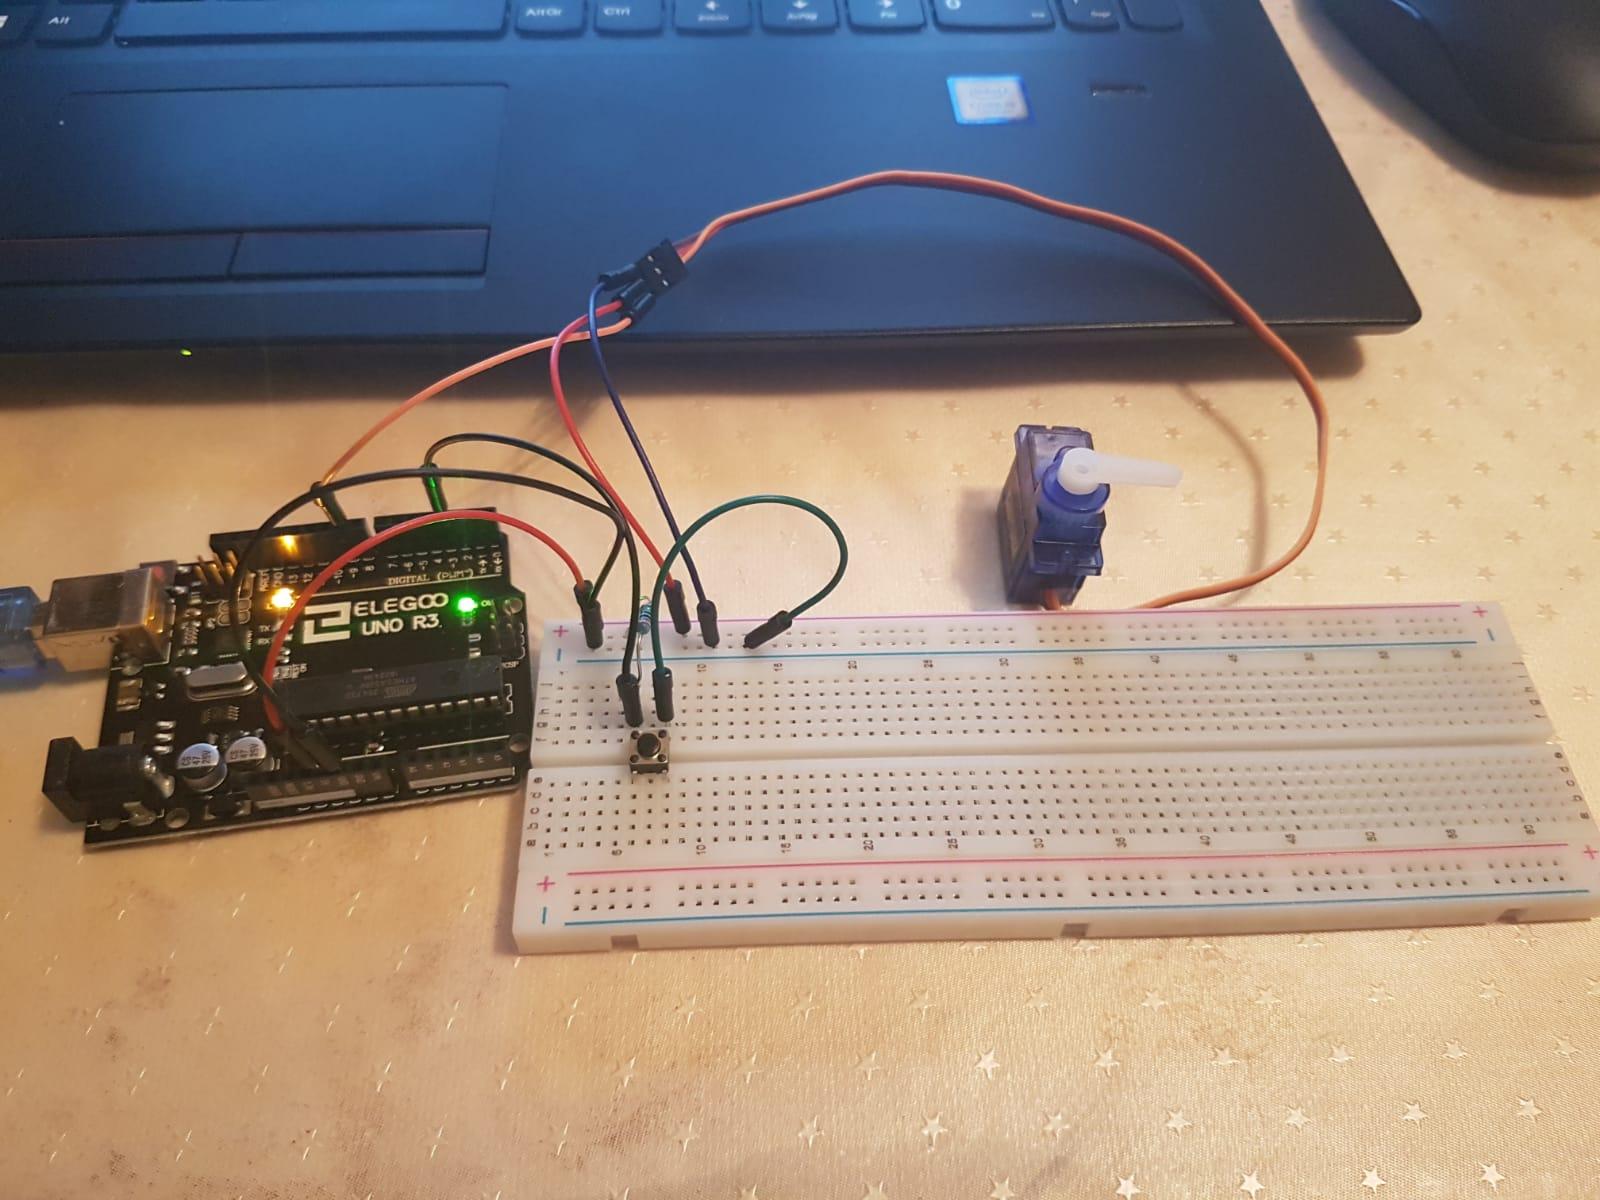 Proyecto con Arduino: operando un servo